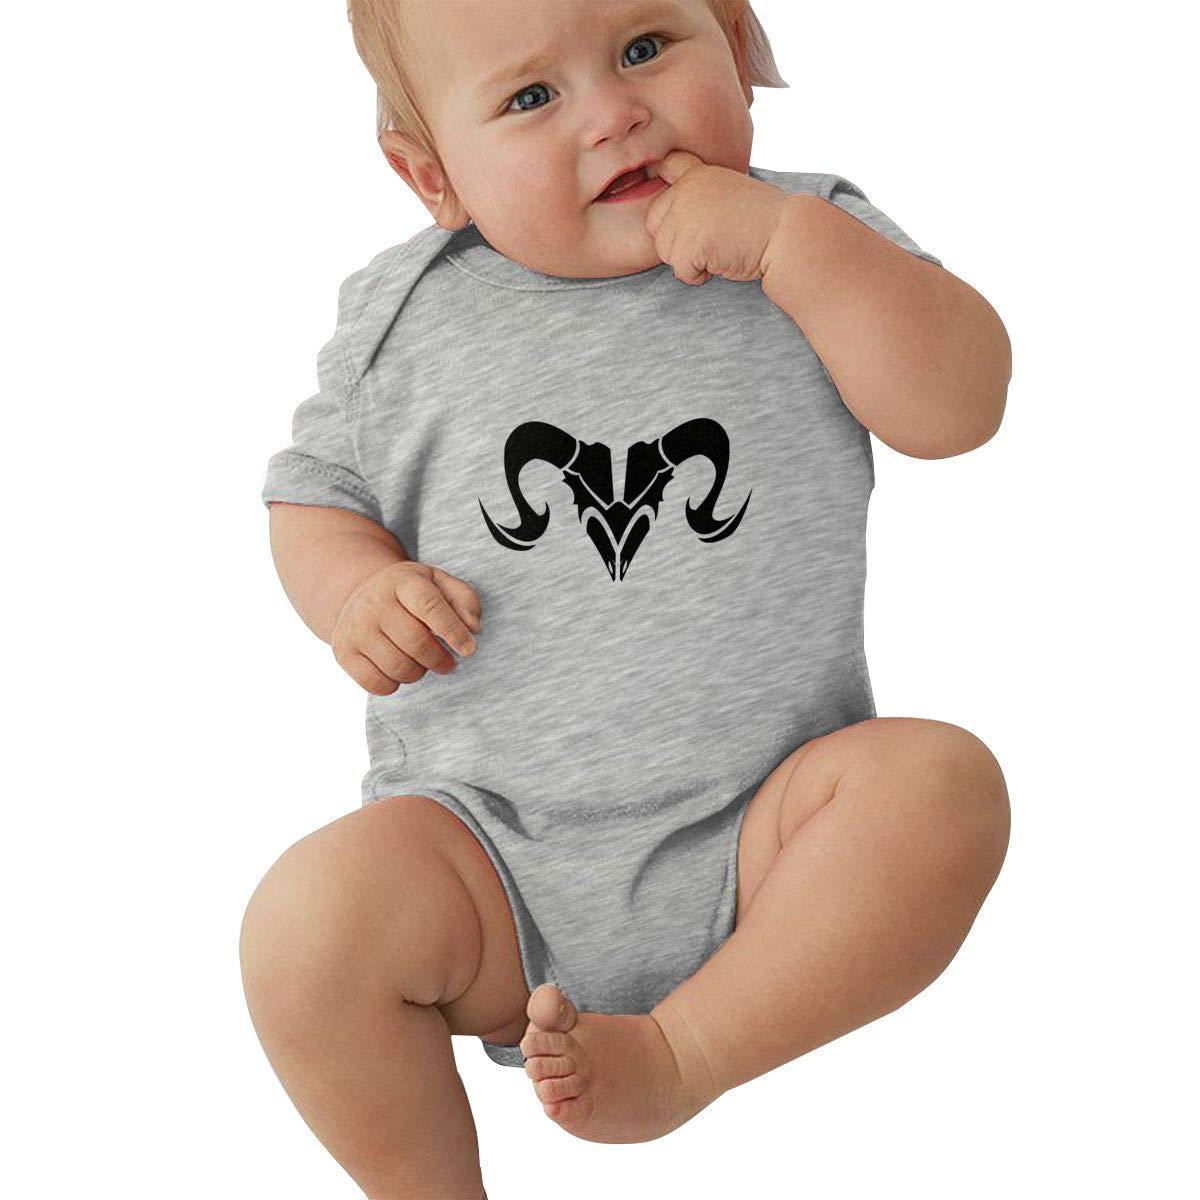 Newborn Baby Boys Bodysuit Short-Sleeve Onesie Zodiac Aries Sign Print Jumpsuit